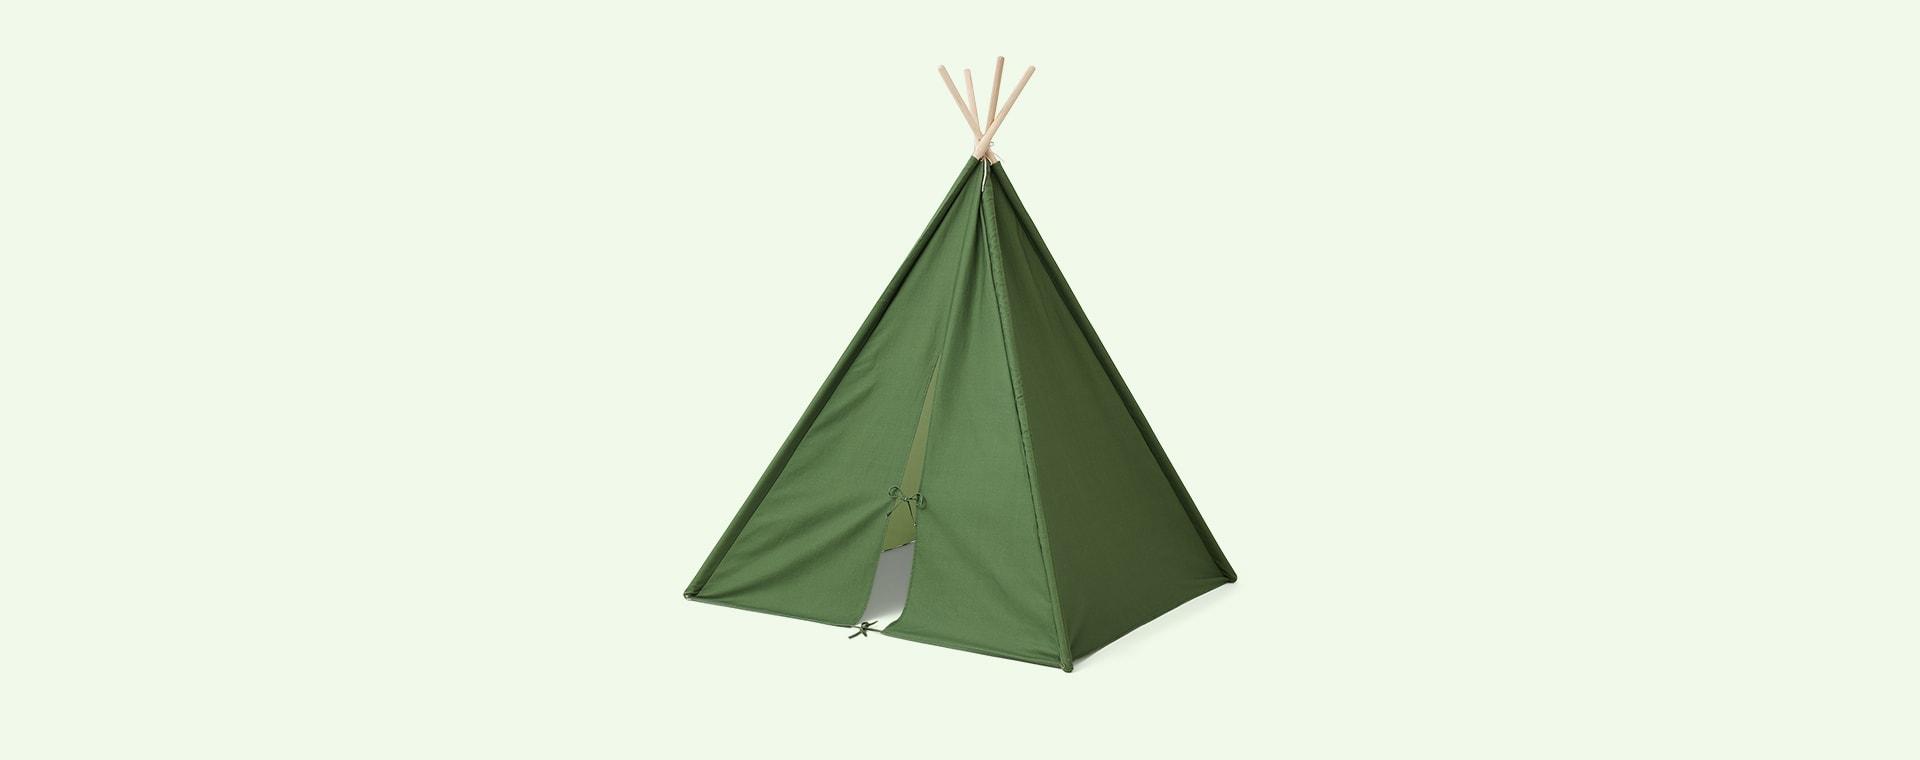 Green Kid's Concept Tipi Tent